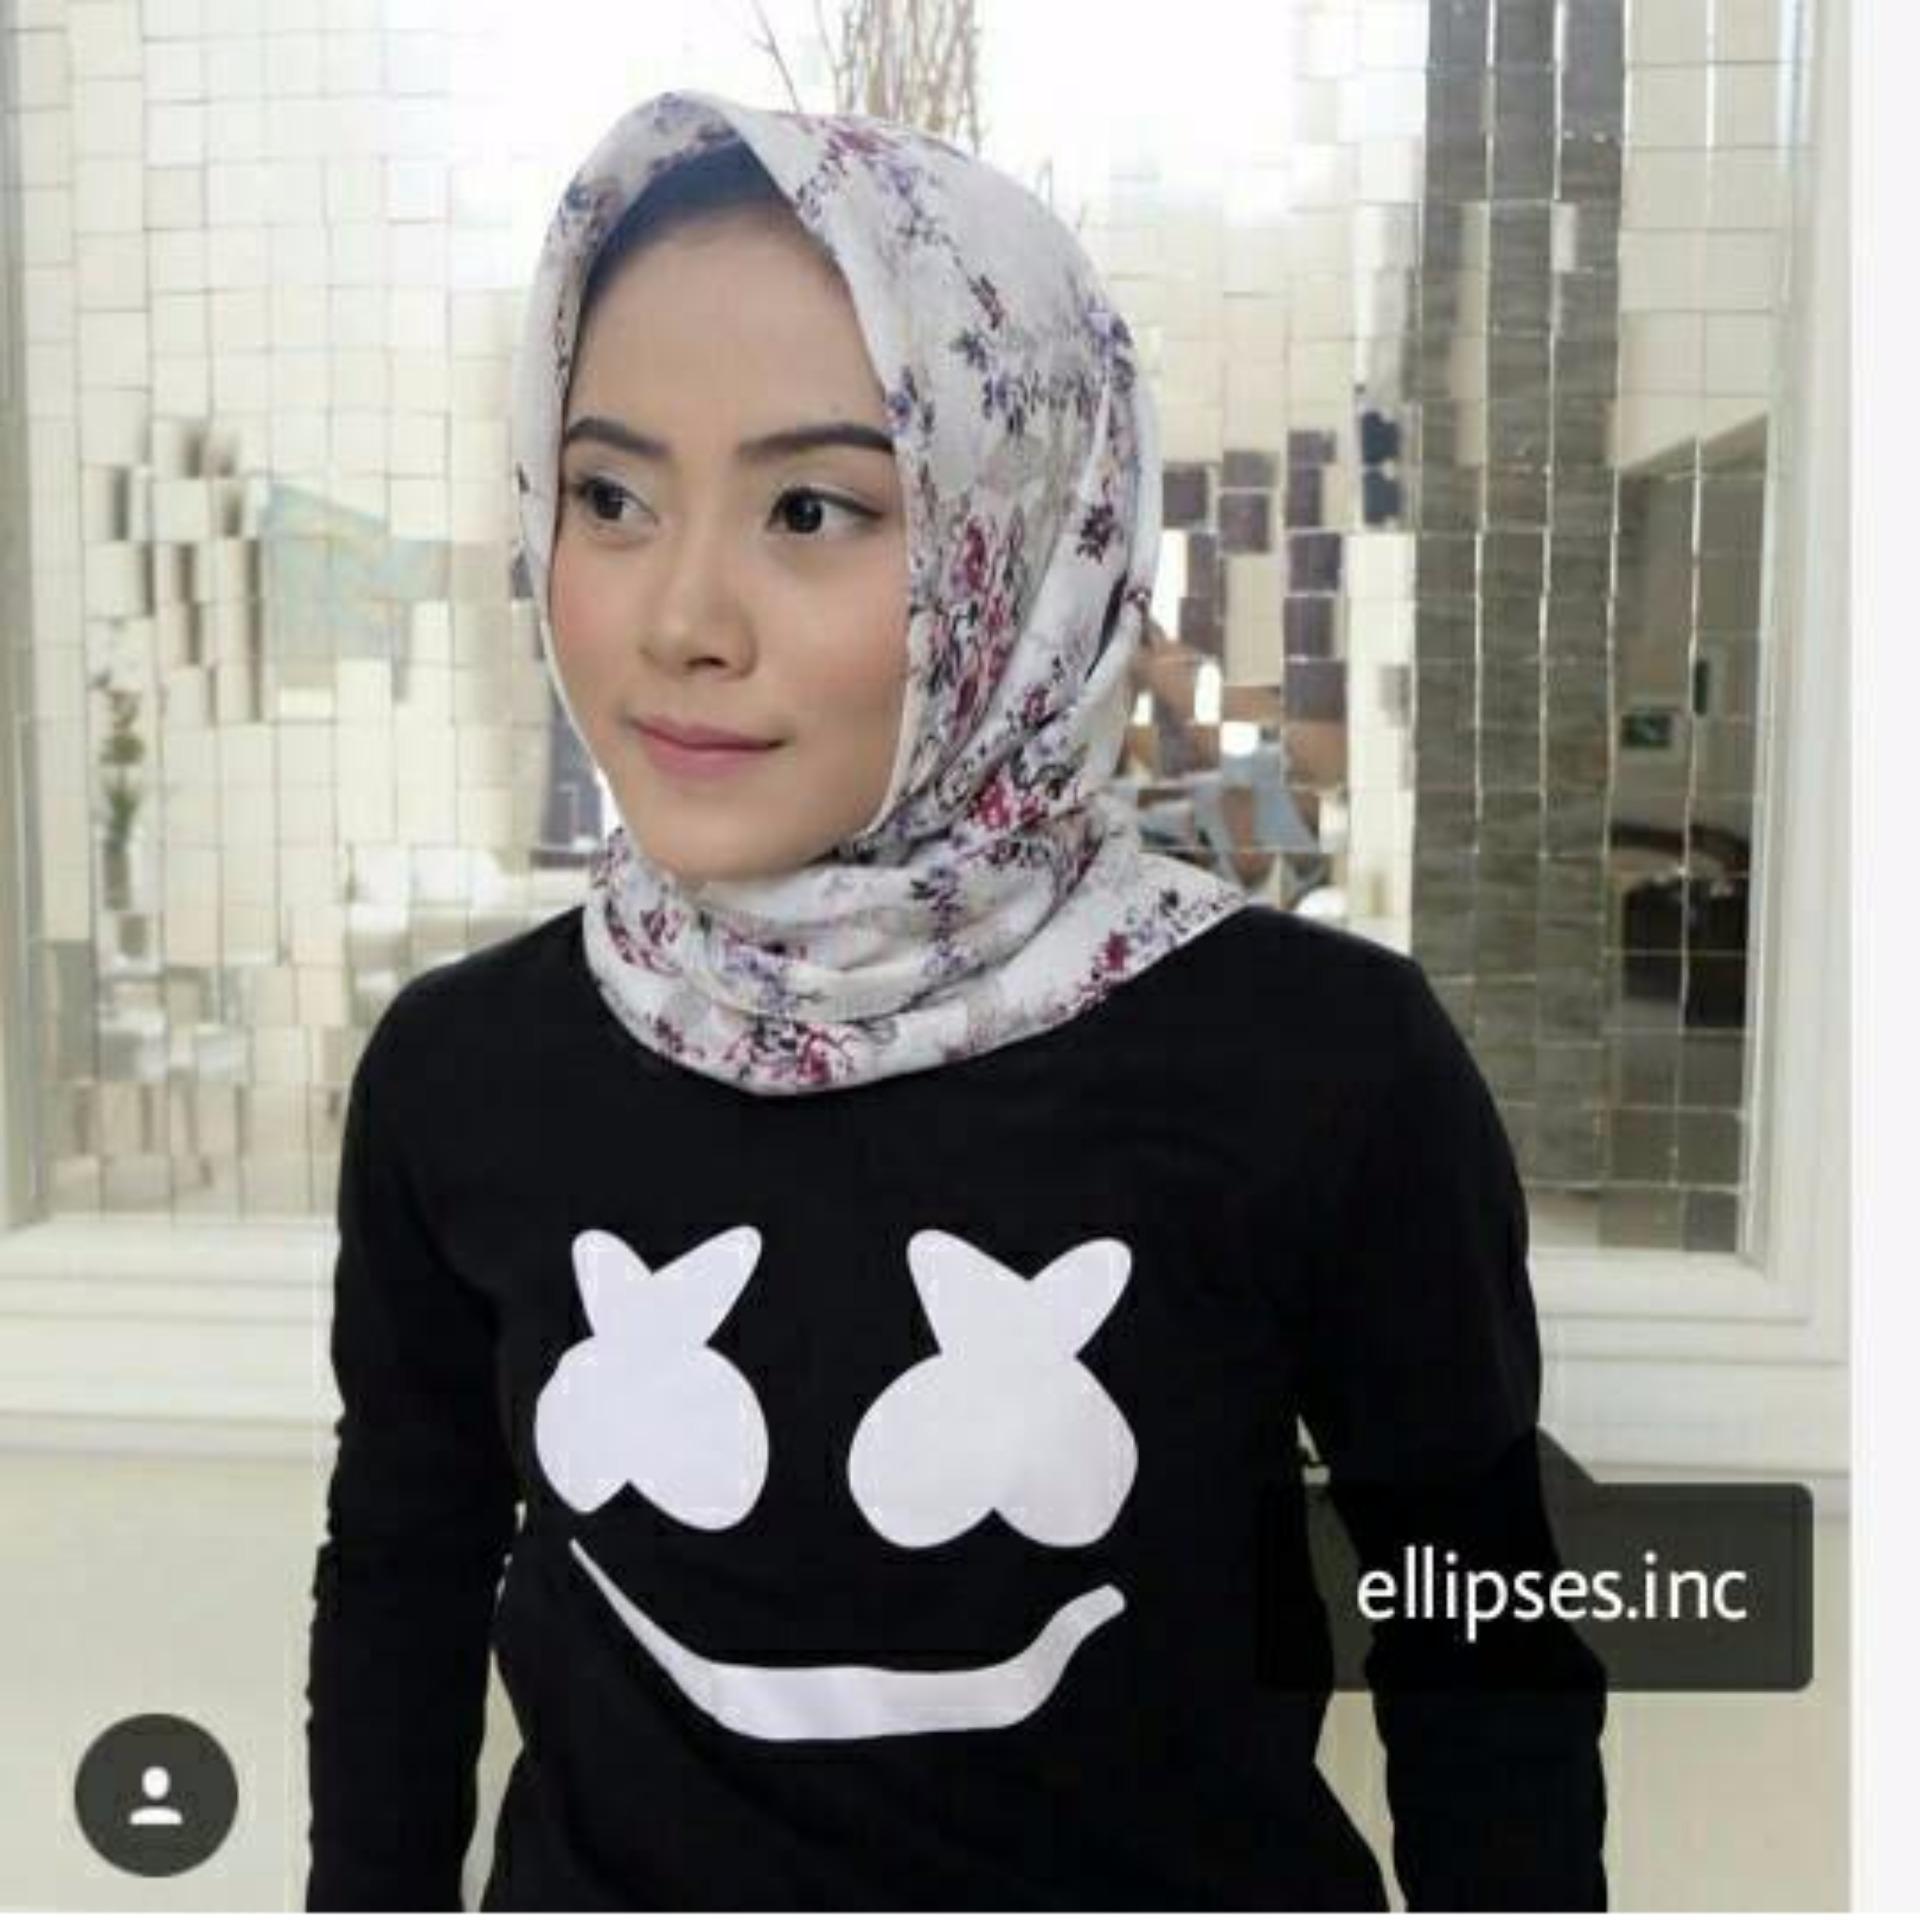 Flash Sale Tumblr Tee / T-Shirt / Kaos Wanita Marshmello - Hitam Lengan Panjang